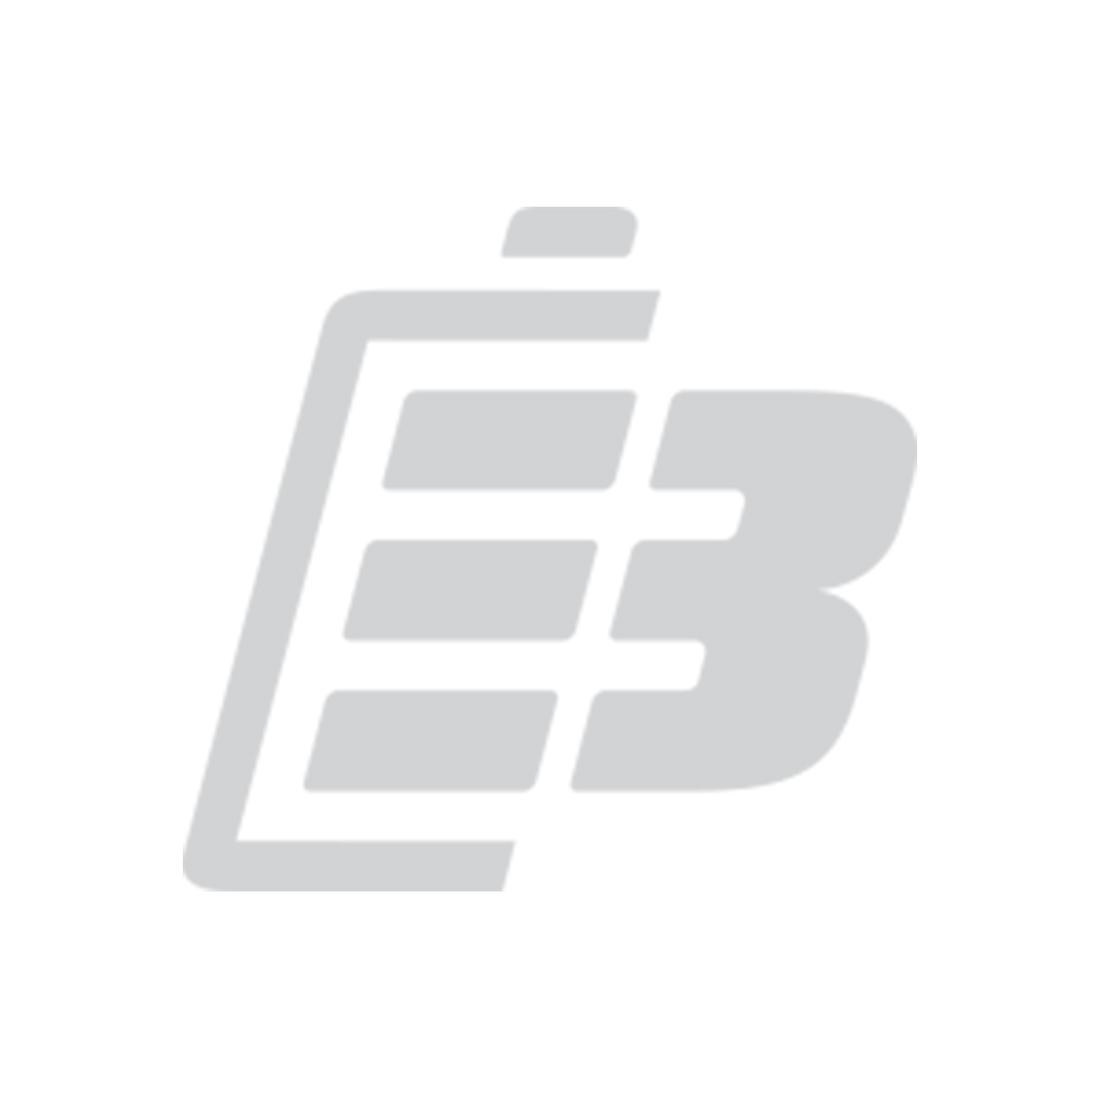 317 Energizer button Battery 1